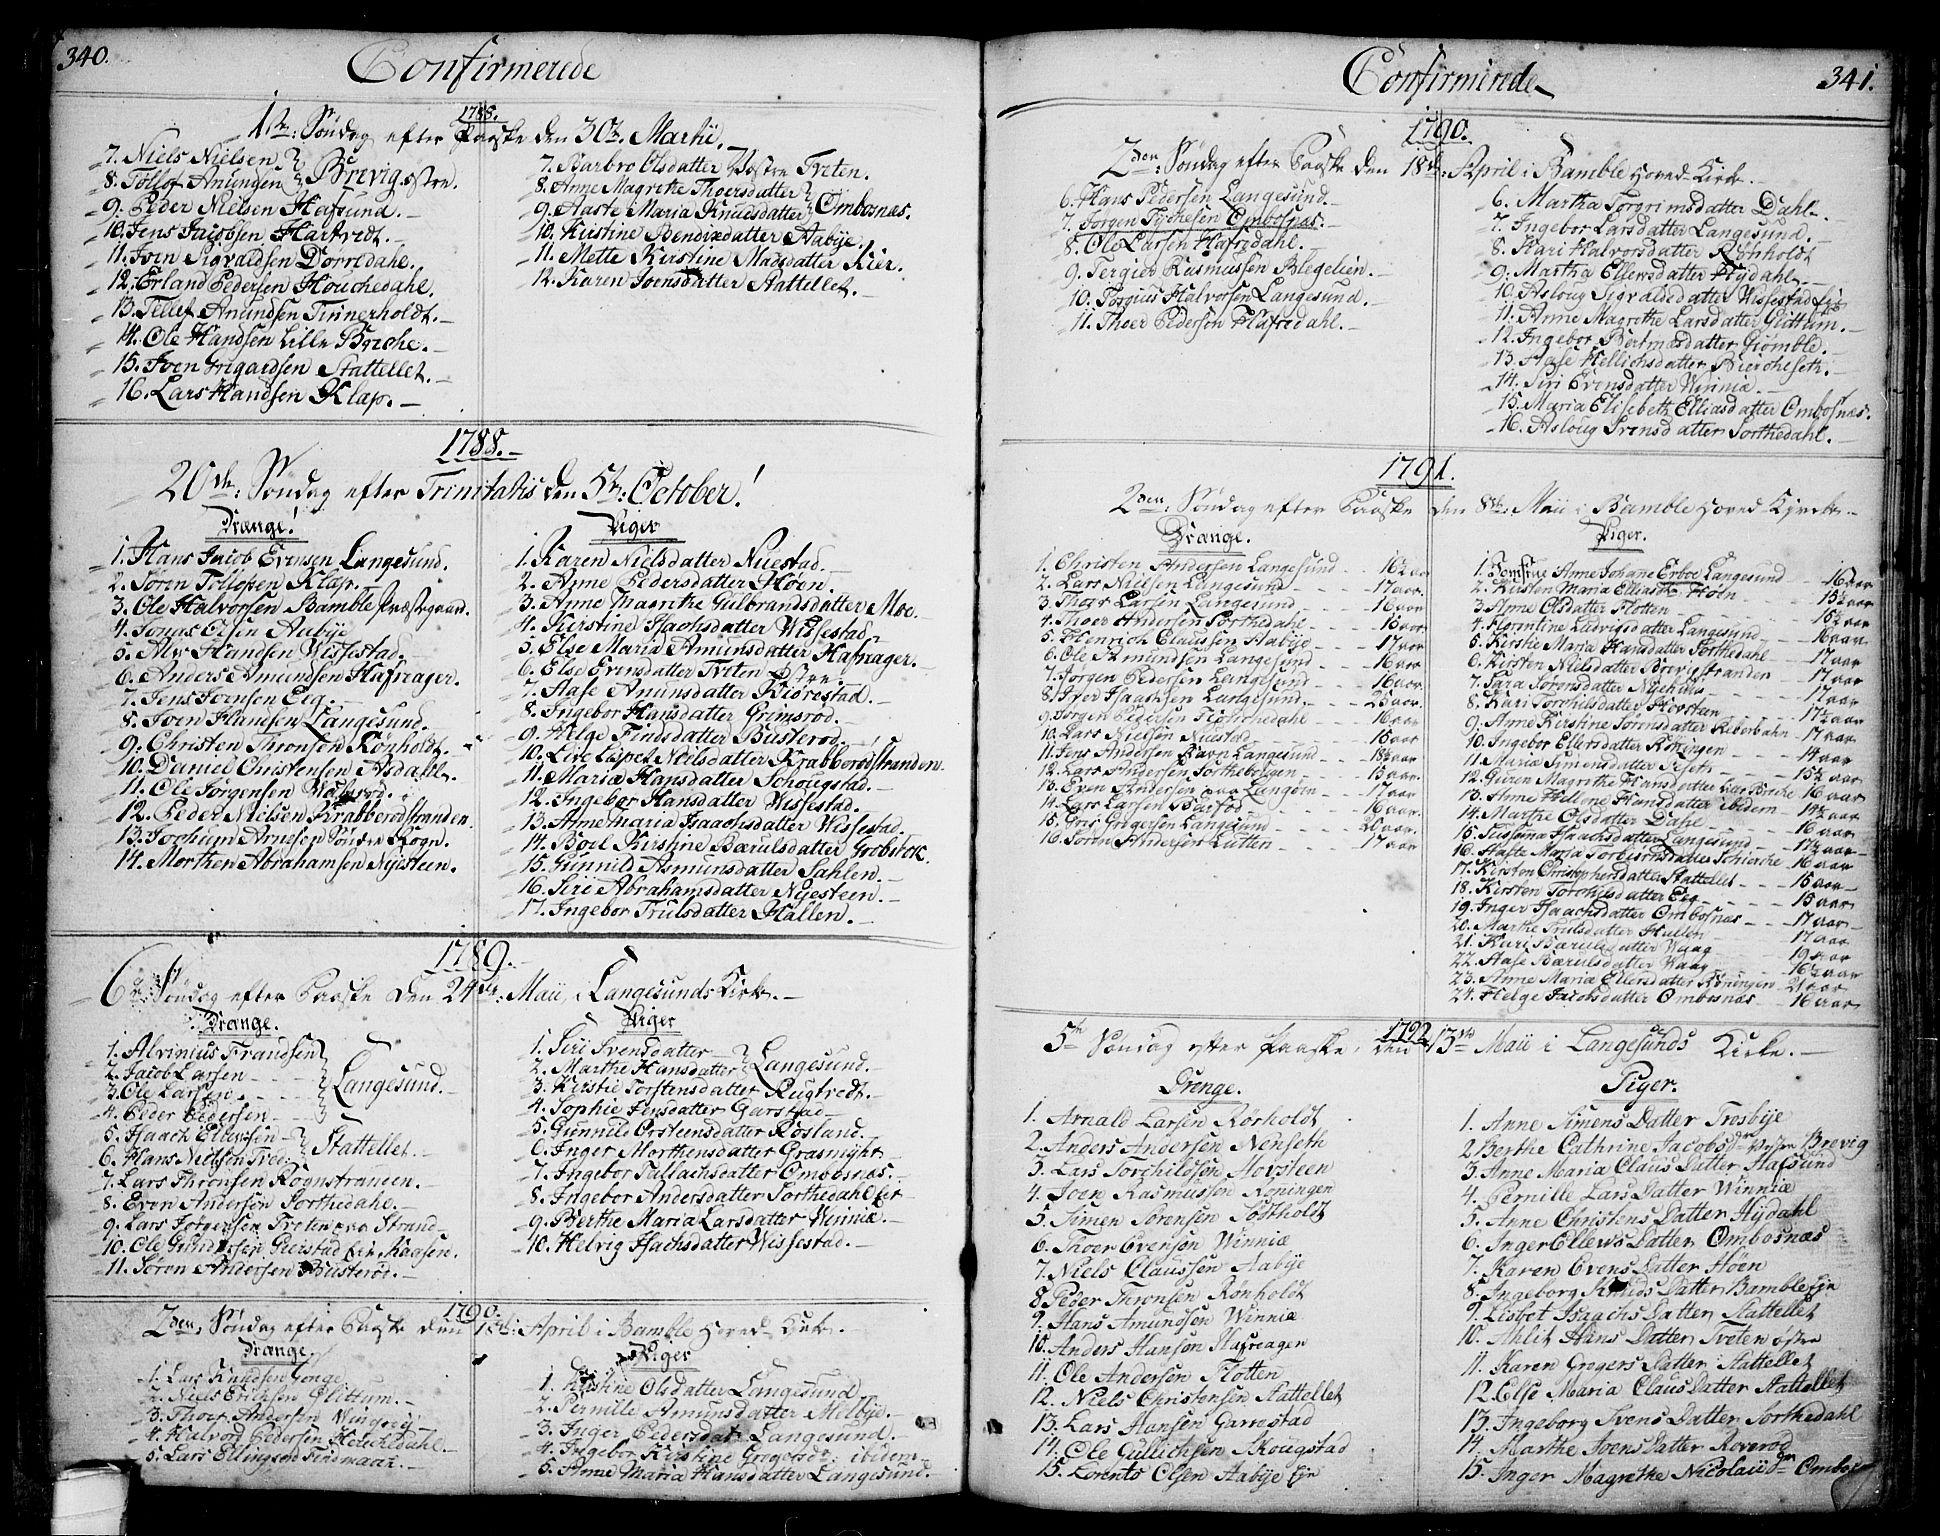 SAKO, Bamble kirkebøker, F/Fa/L0002: Ministerialbok nr. I 2, 1775-1814, s. 340-341